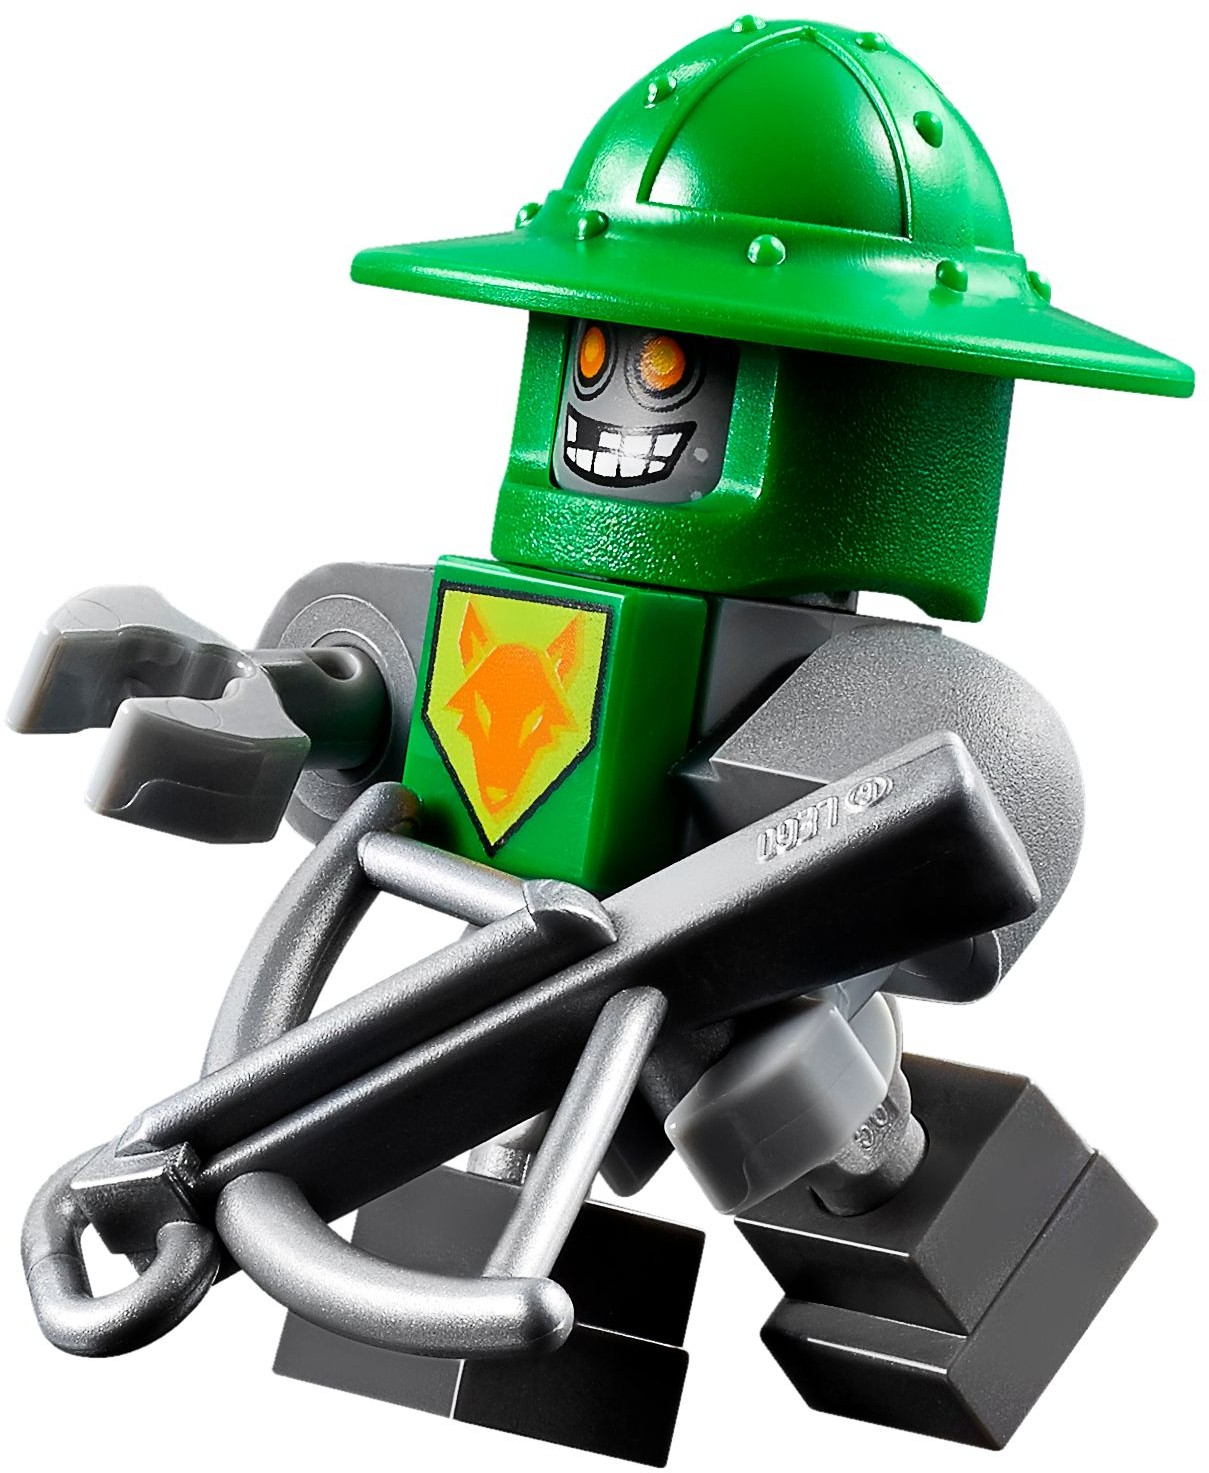 Aaron's Squirebot